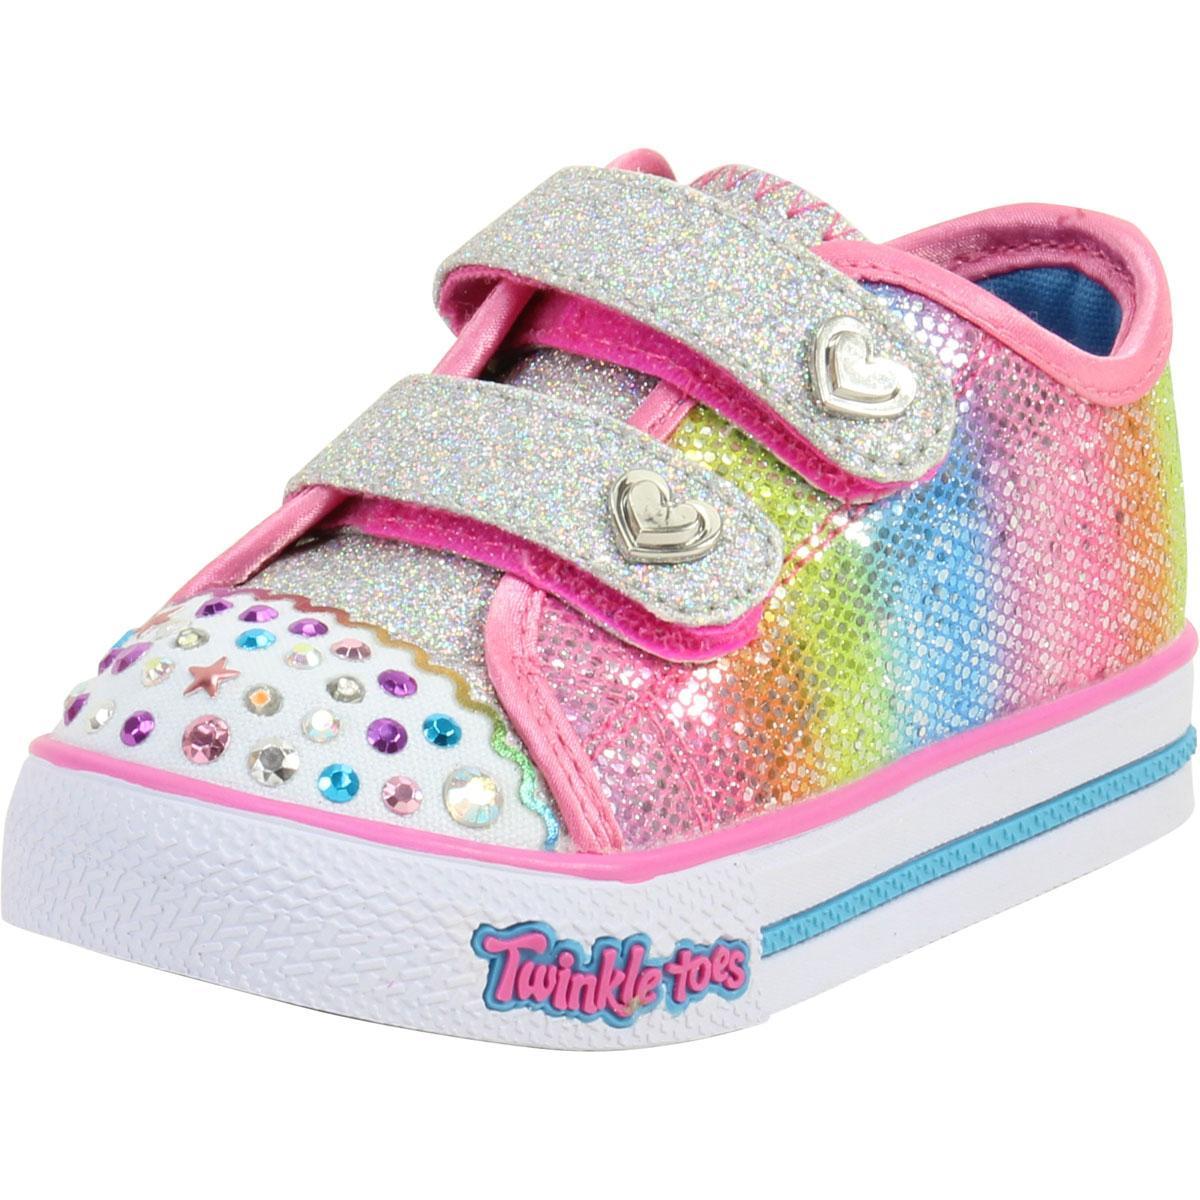 Sparkle Kicks Light Up Sneakers Shoes